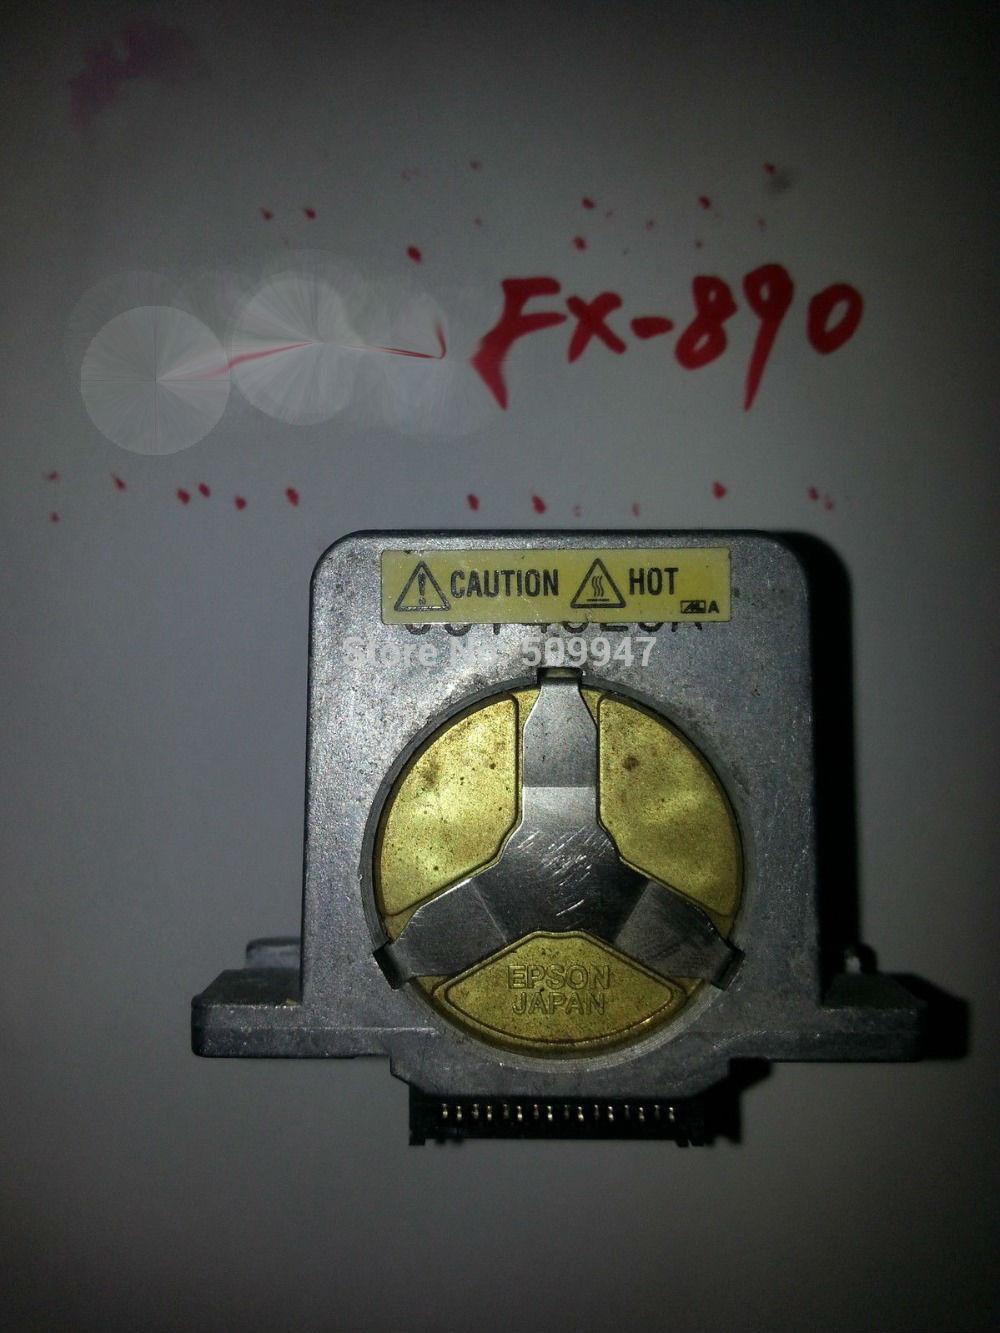 brand PRINTHEAD refurbished FOR EPSON FX 890 printerbrand PRINTHEAD refurbished FOR EPSON FX 890 printer